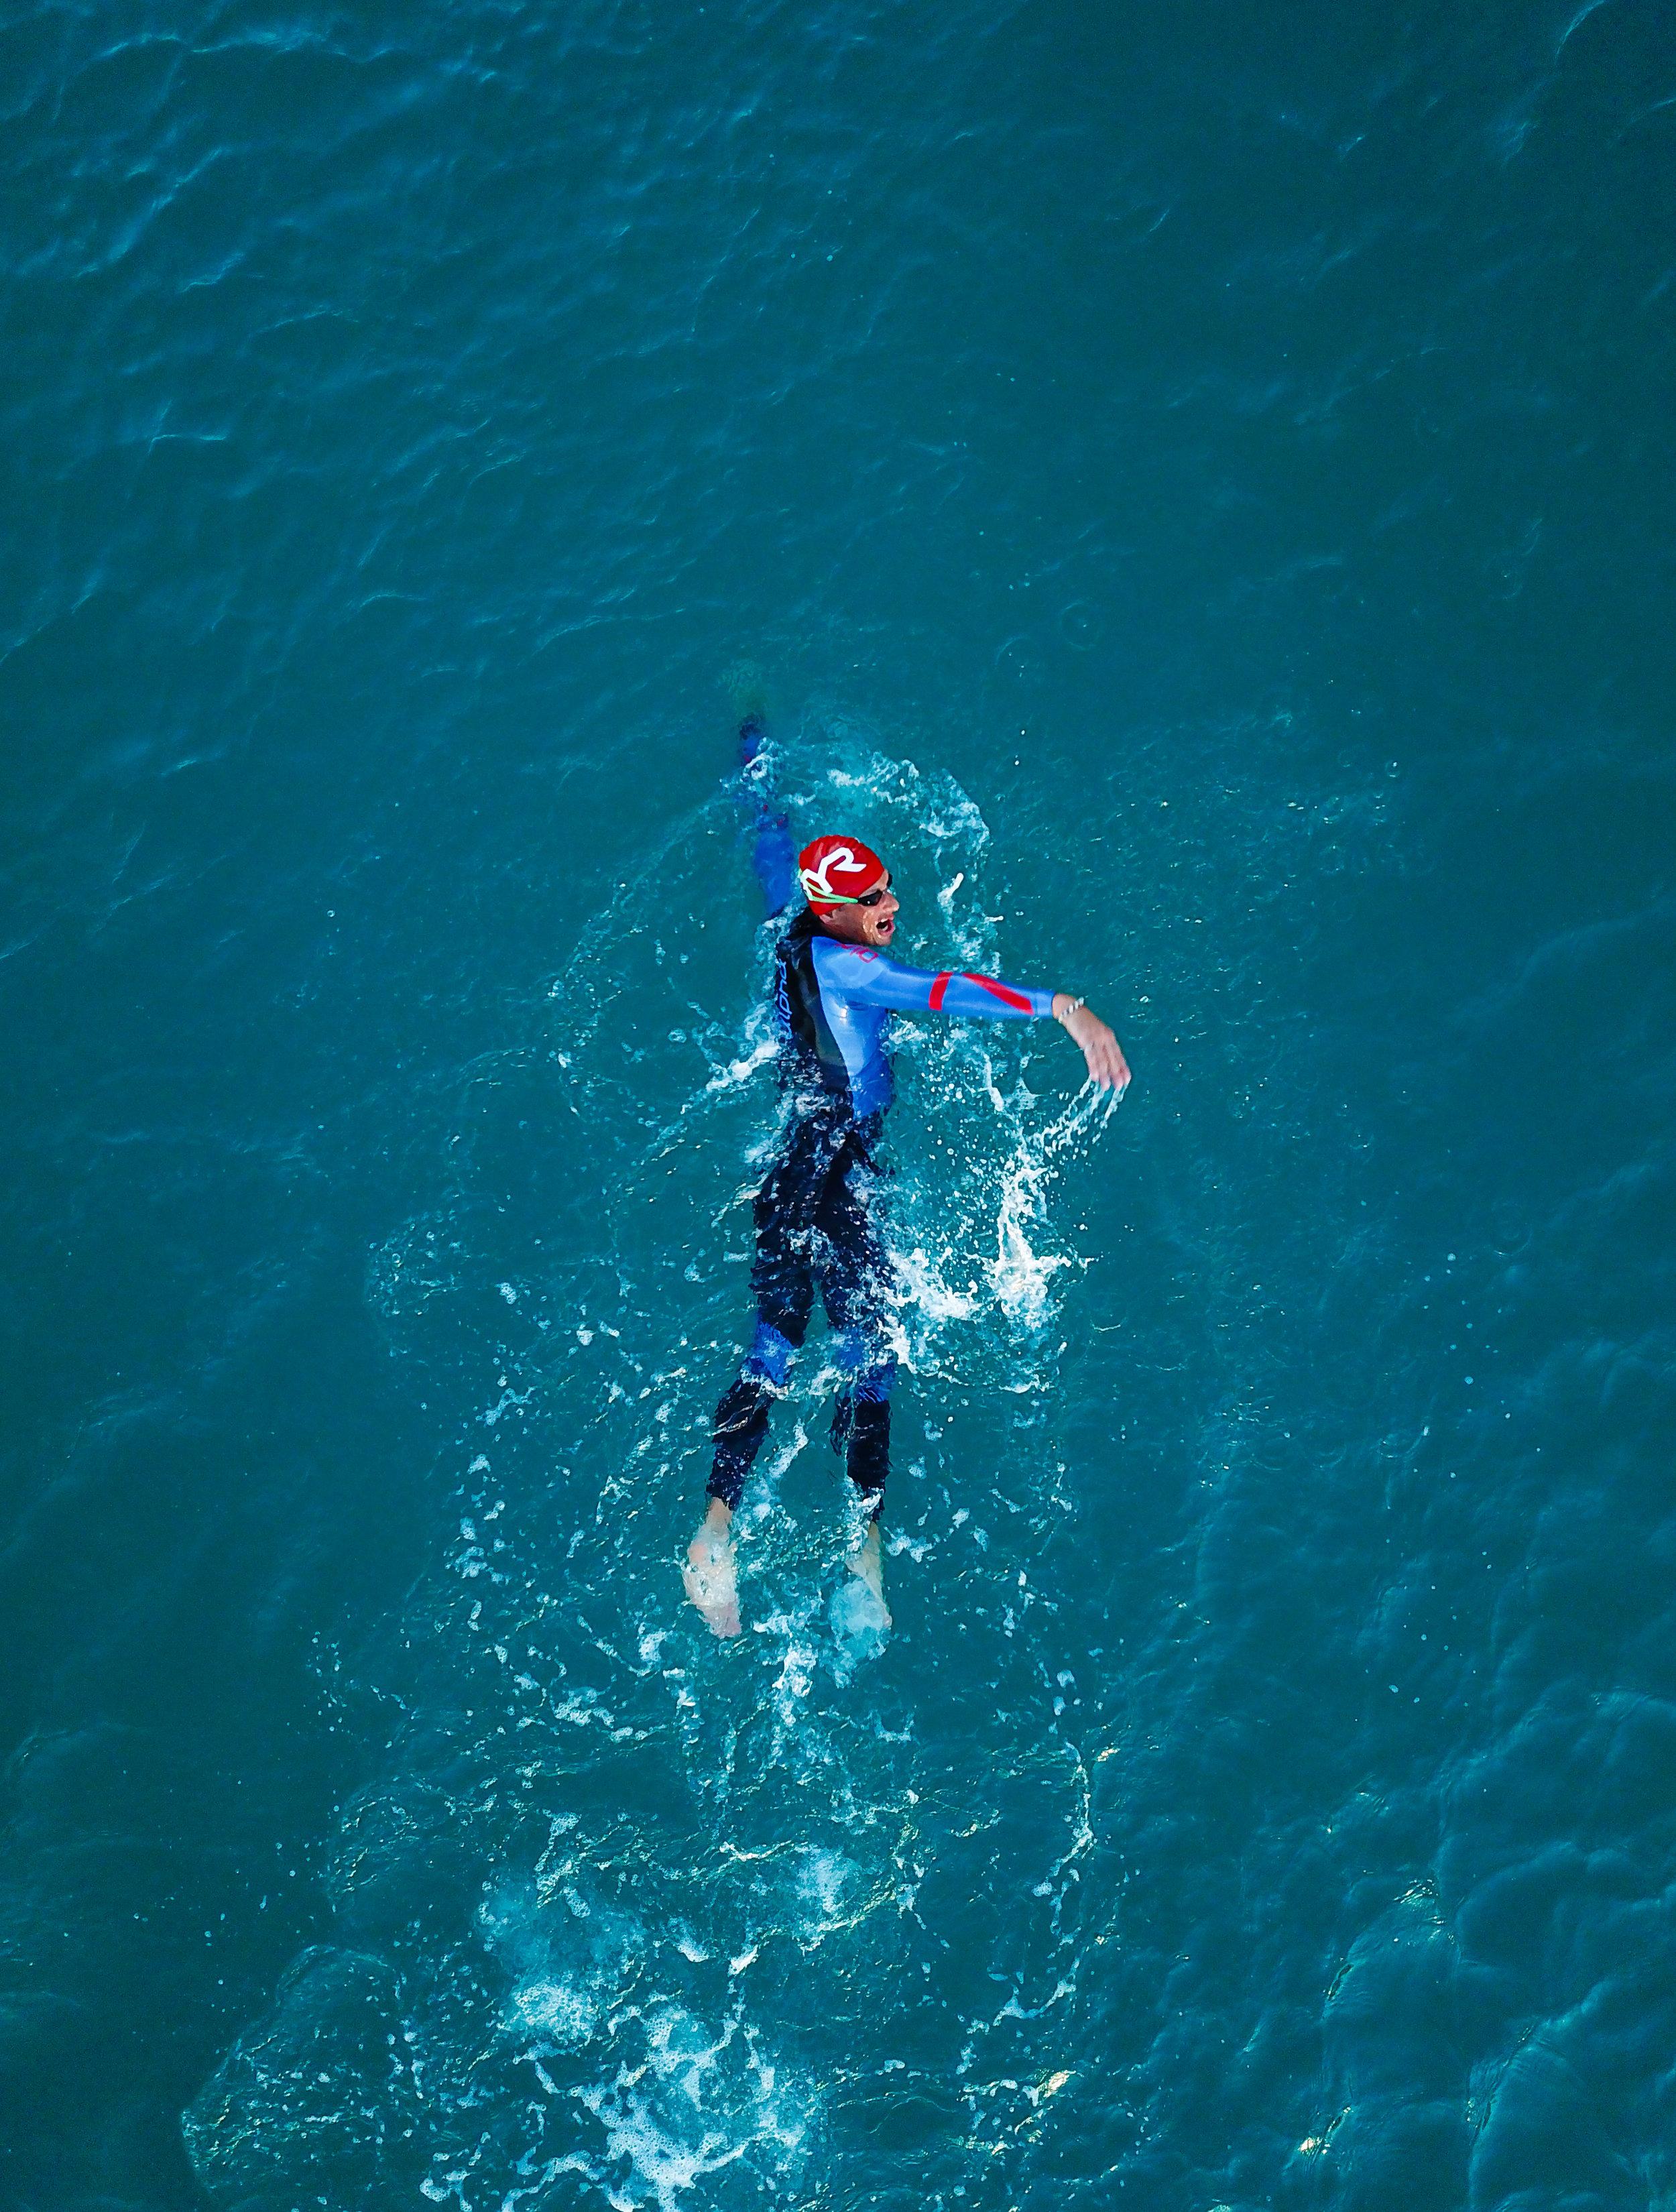 dji drone swimmer athletic